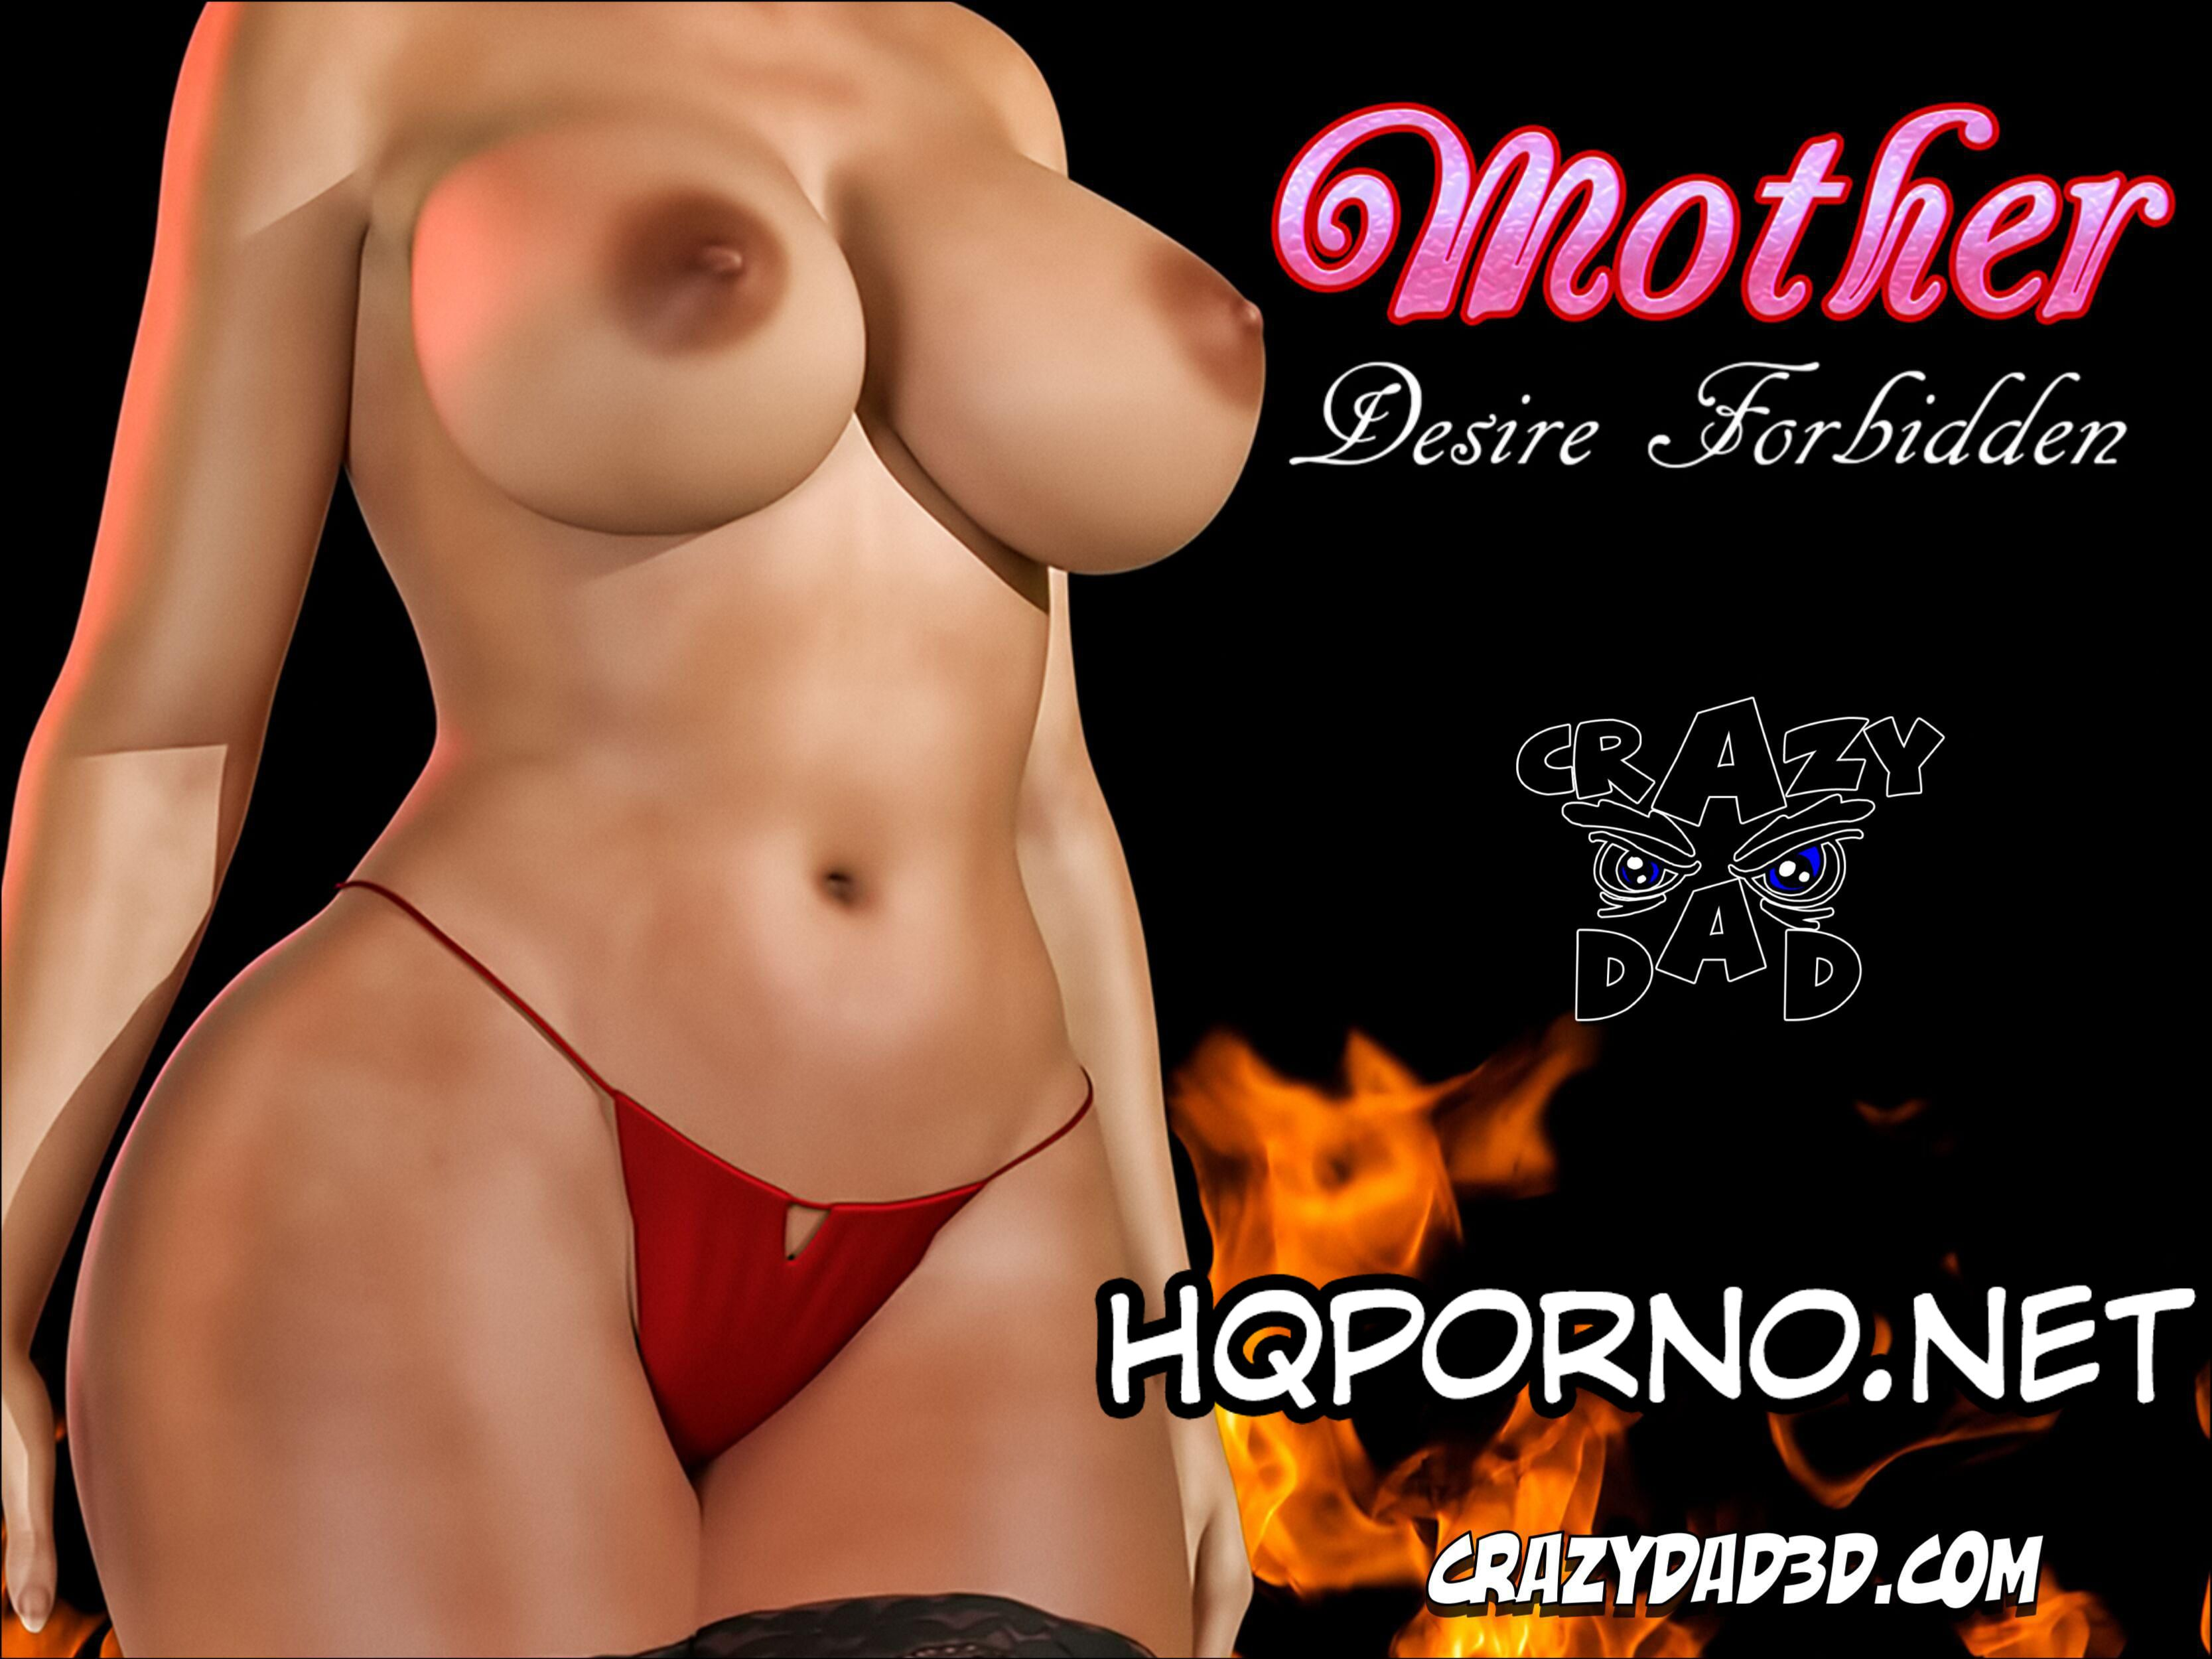 Mãe-desejo-proibido-01-1